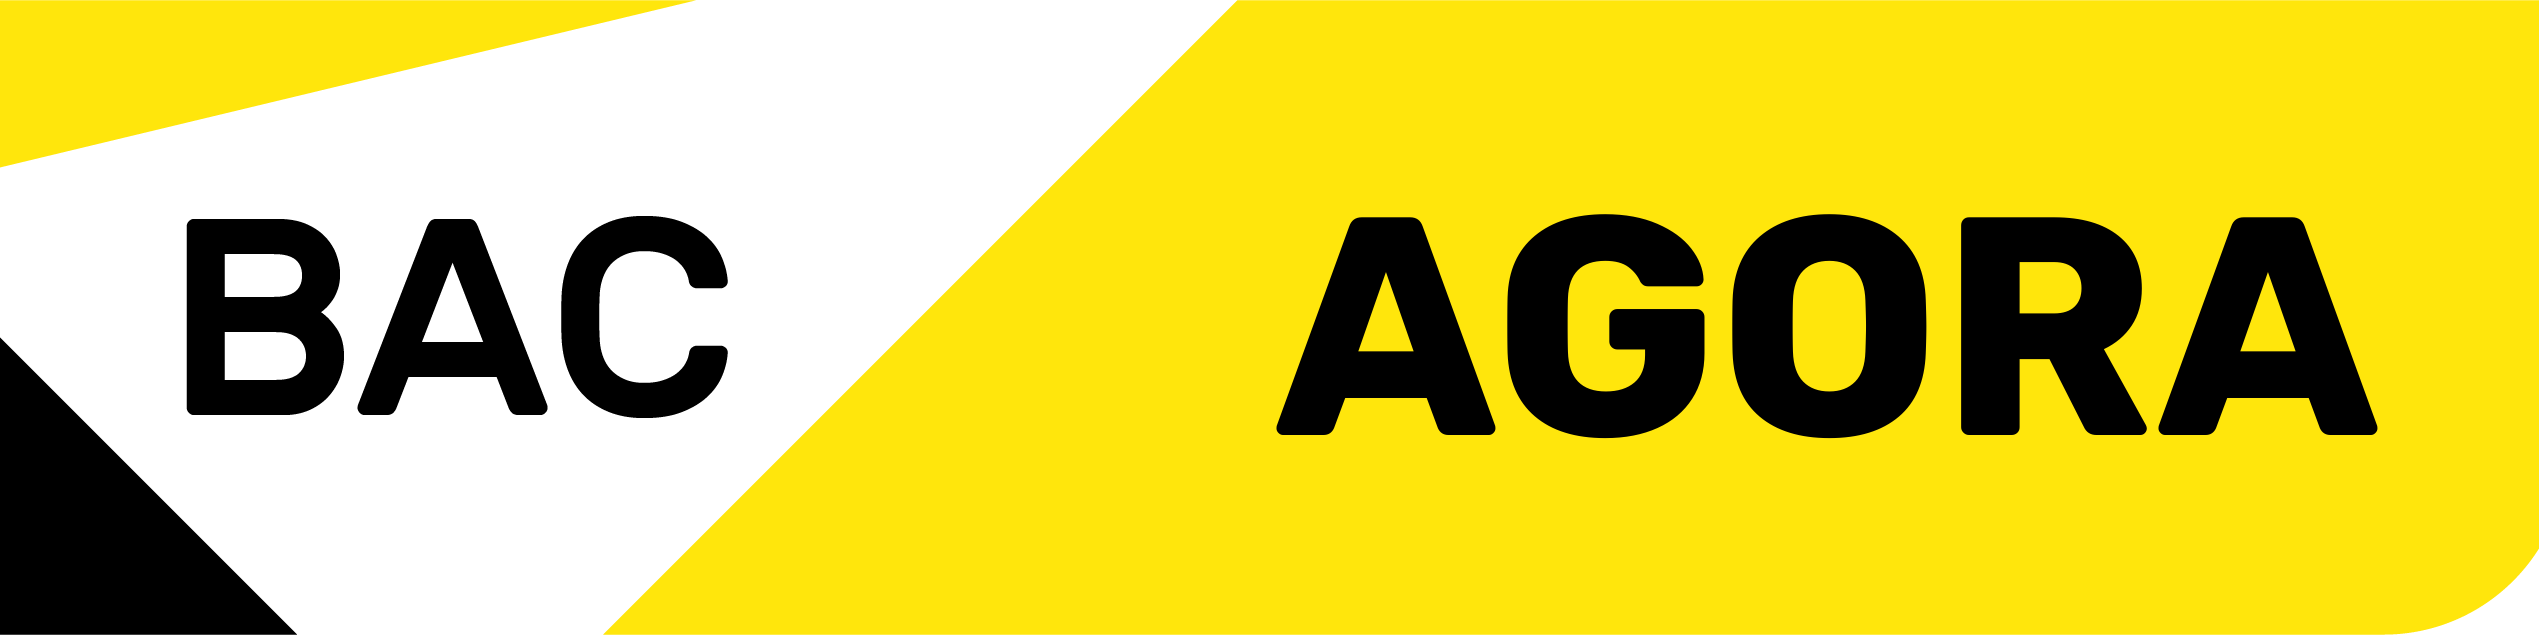 logo-BAC-AGORA.png